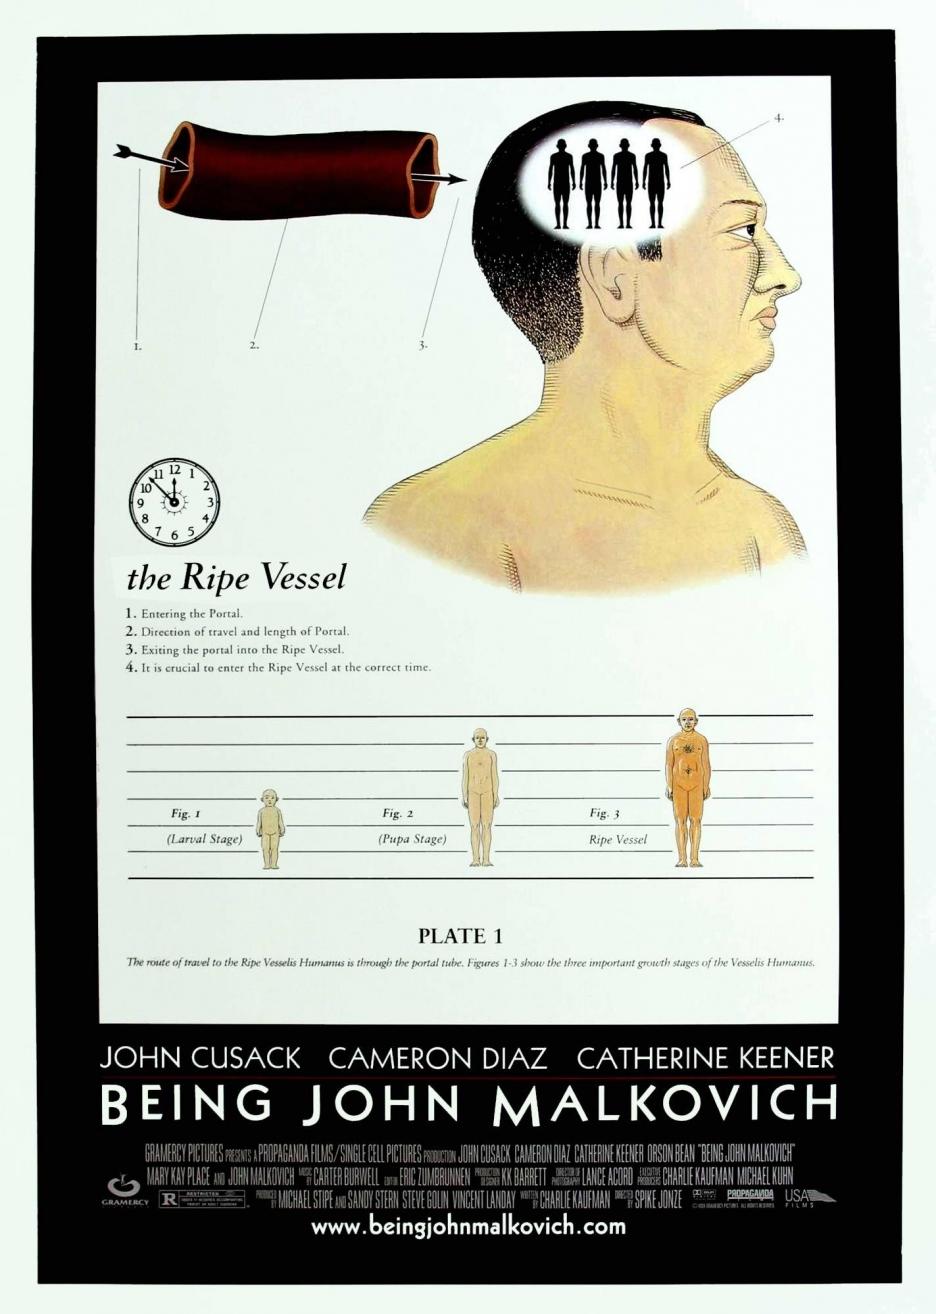 poster john malkovich